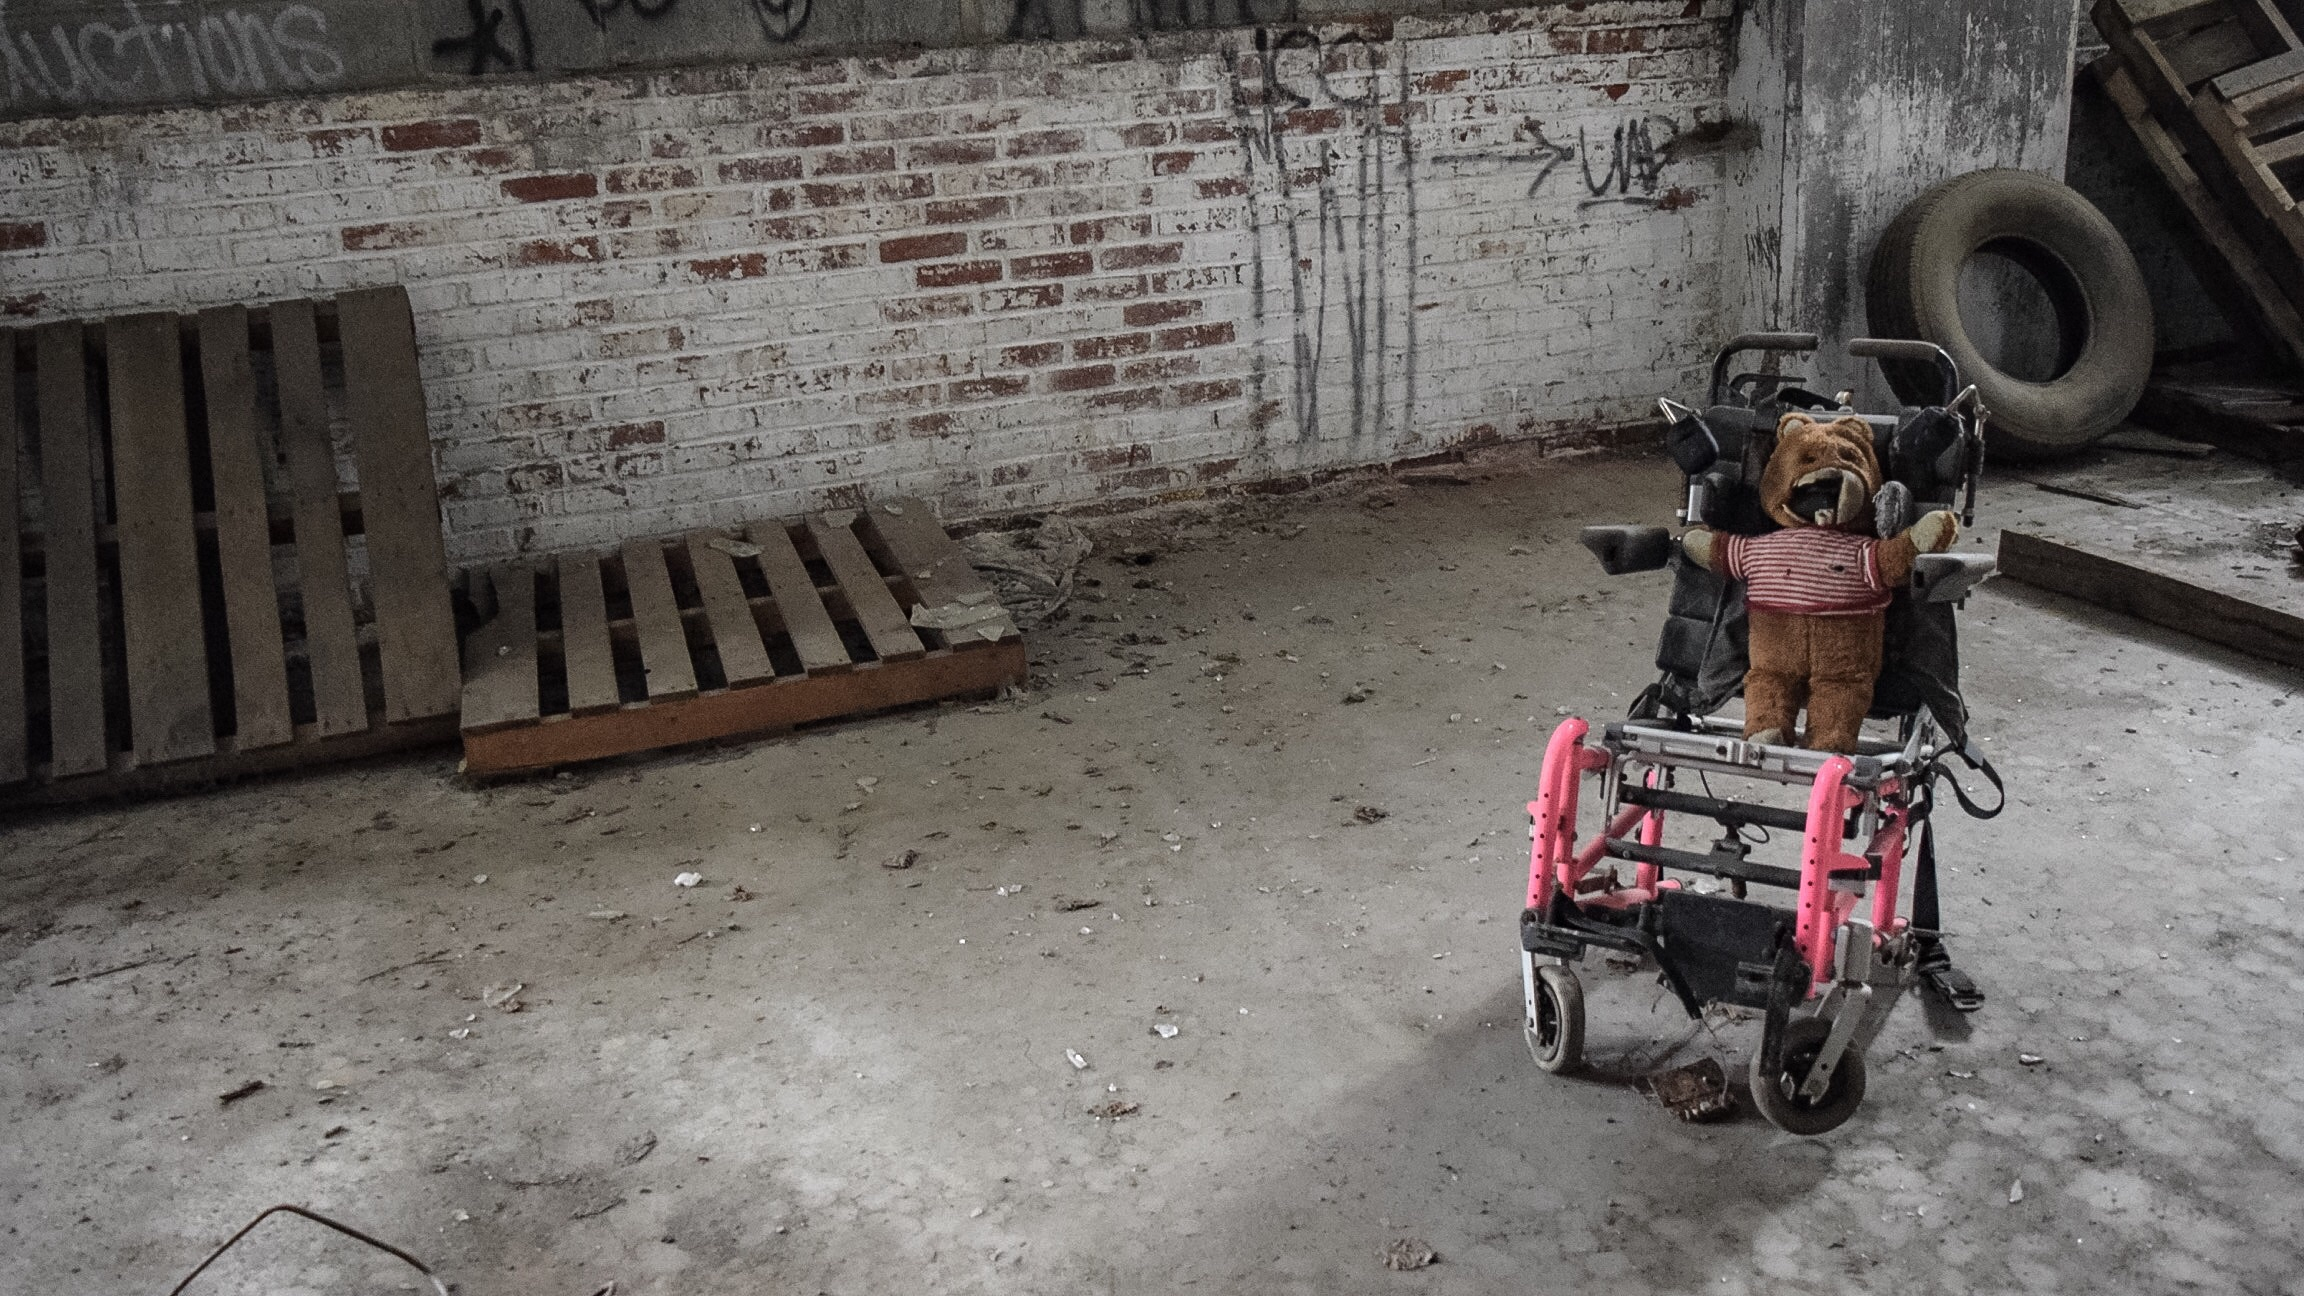 A disfigured teddy bear in a wheel chair.